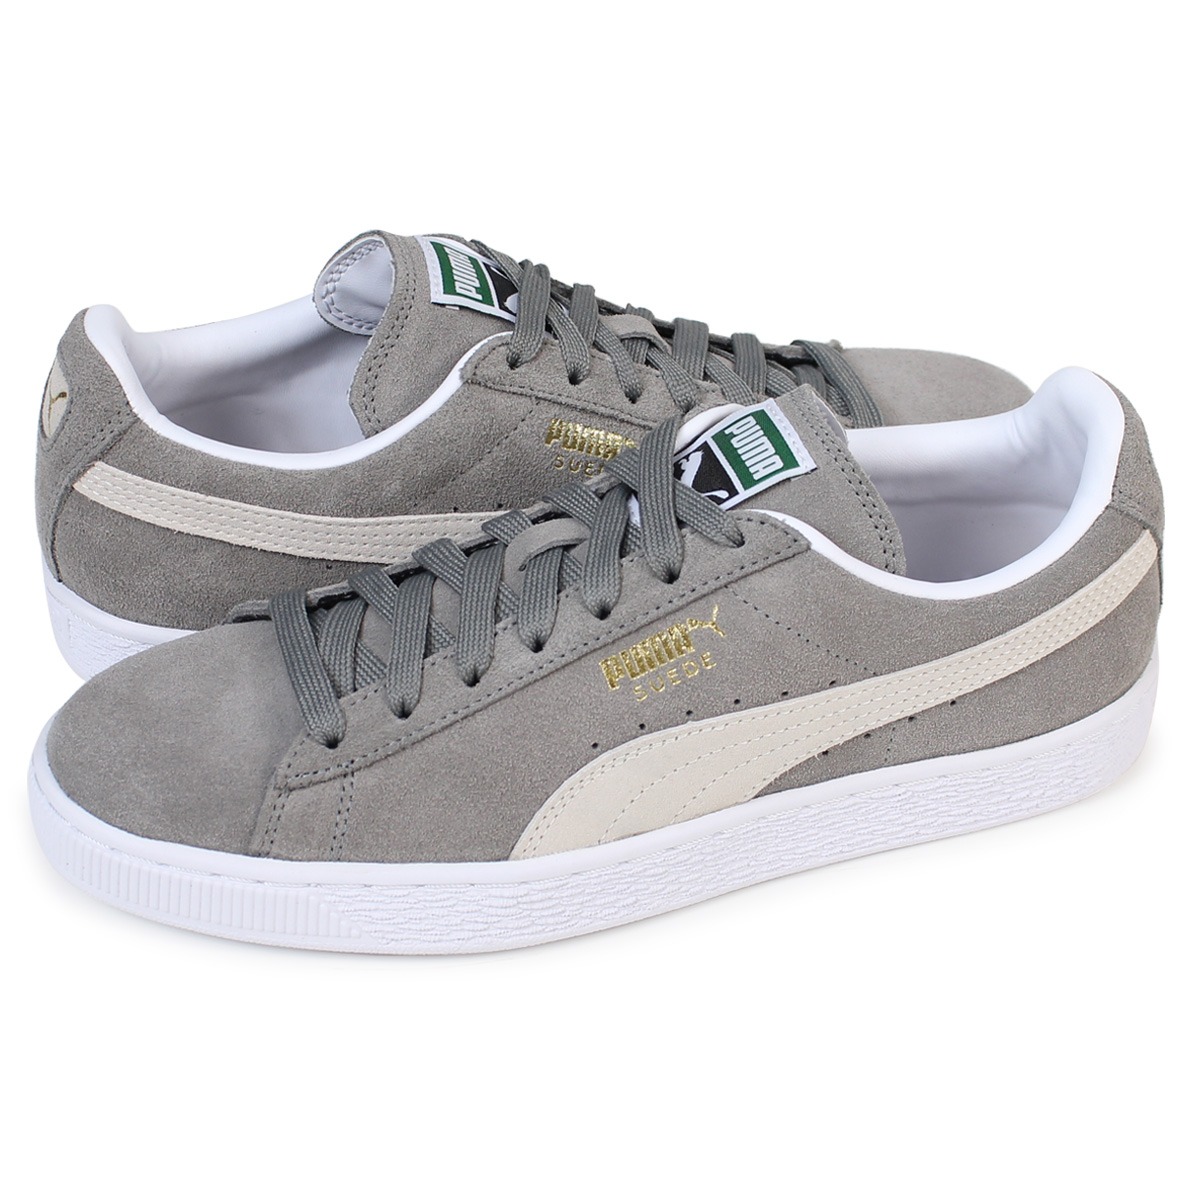 puma sneakers gray